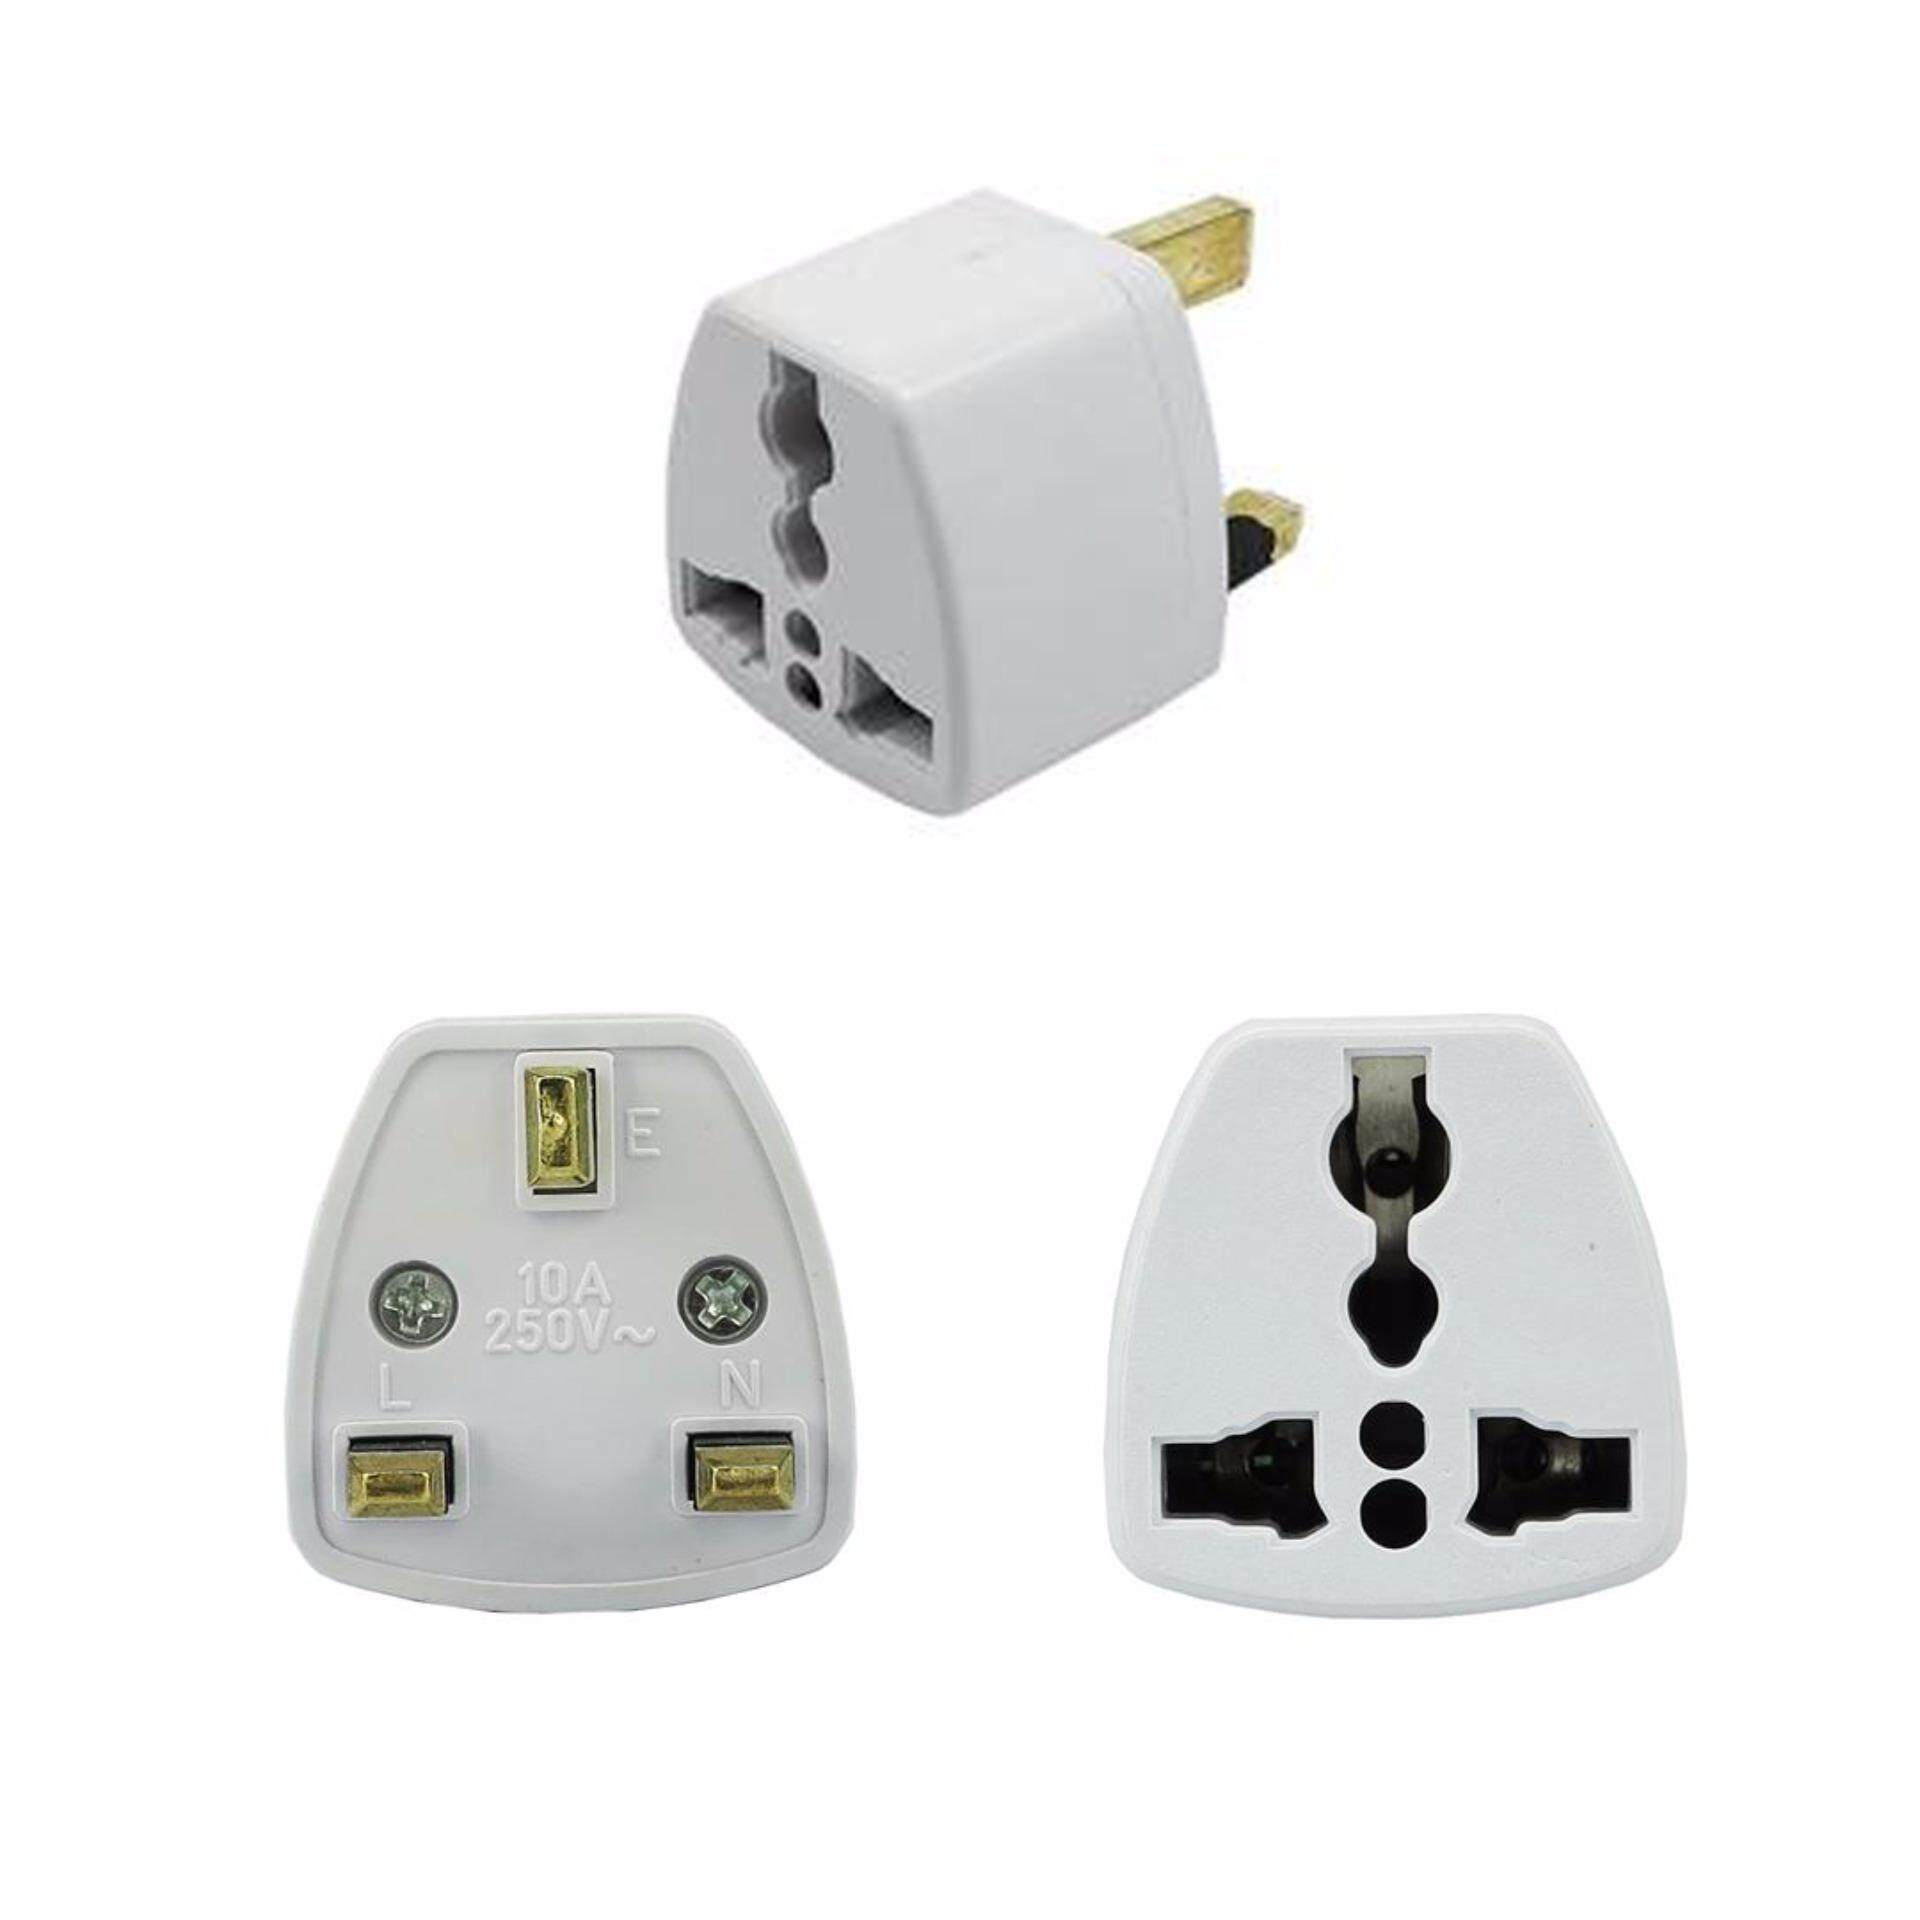 3pcs British Socket Adapter 3 Pin Travel Universal Adaptor Plug